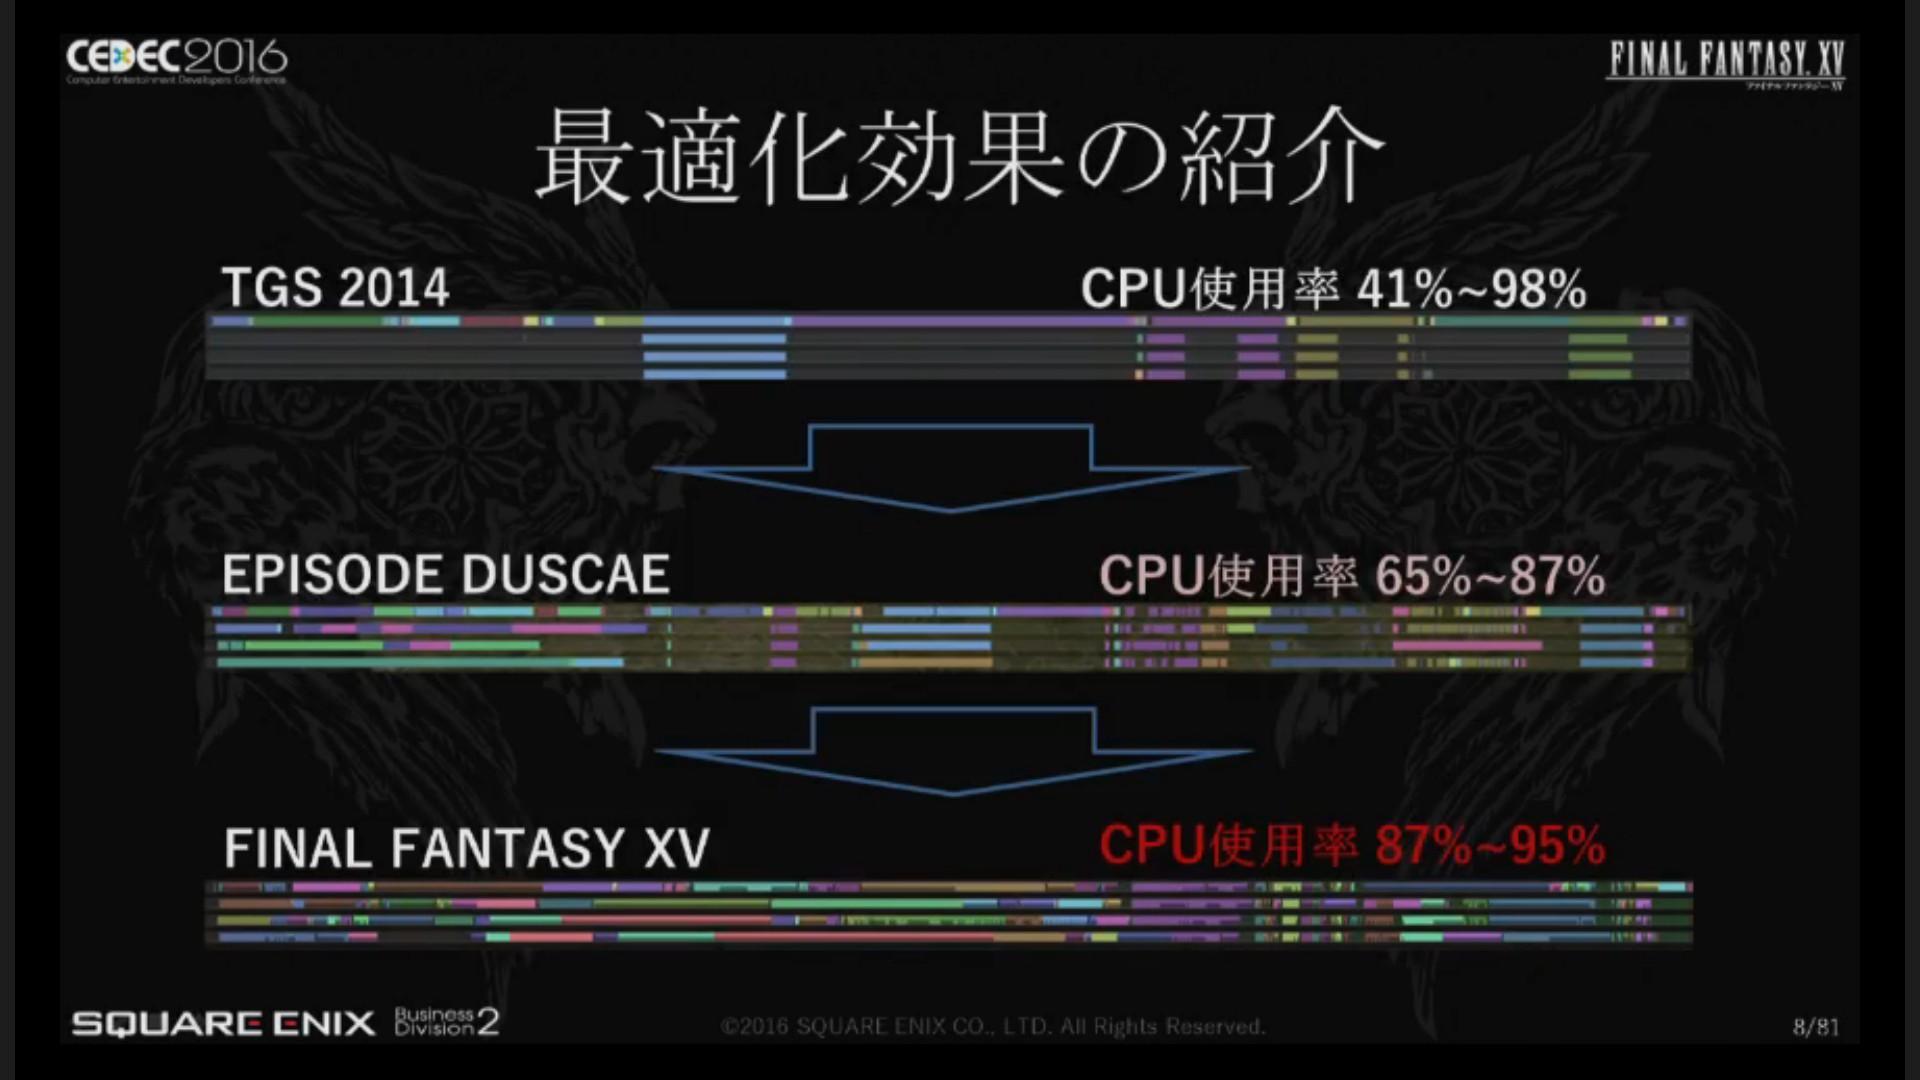 Final-Fantasy-XV-290816-002